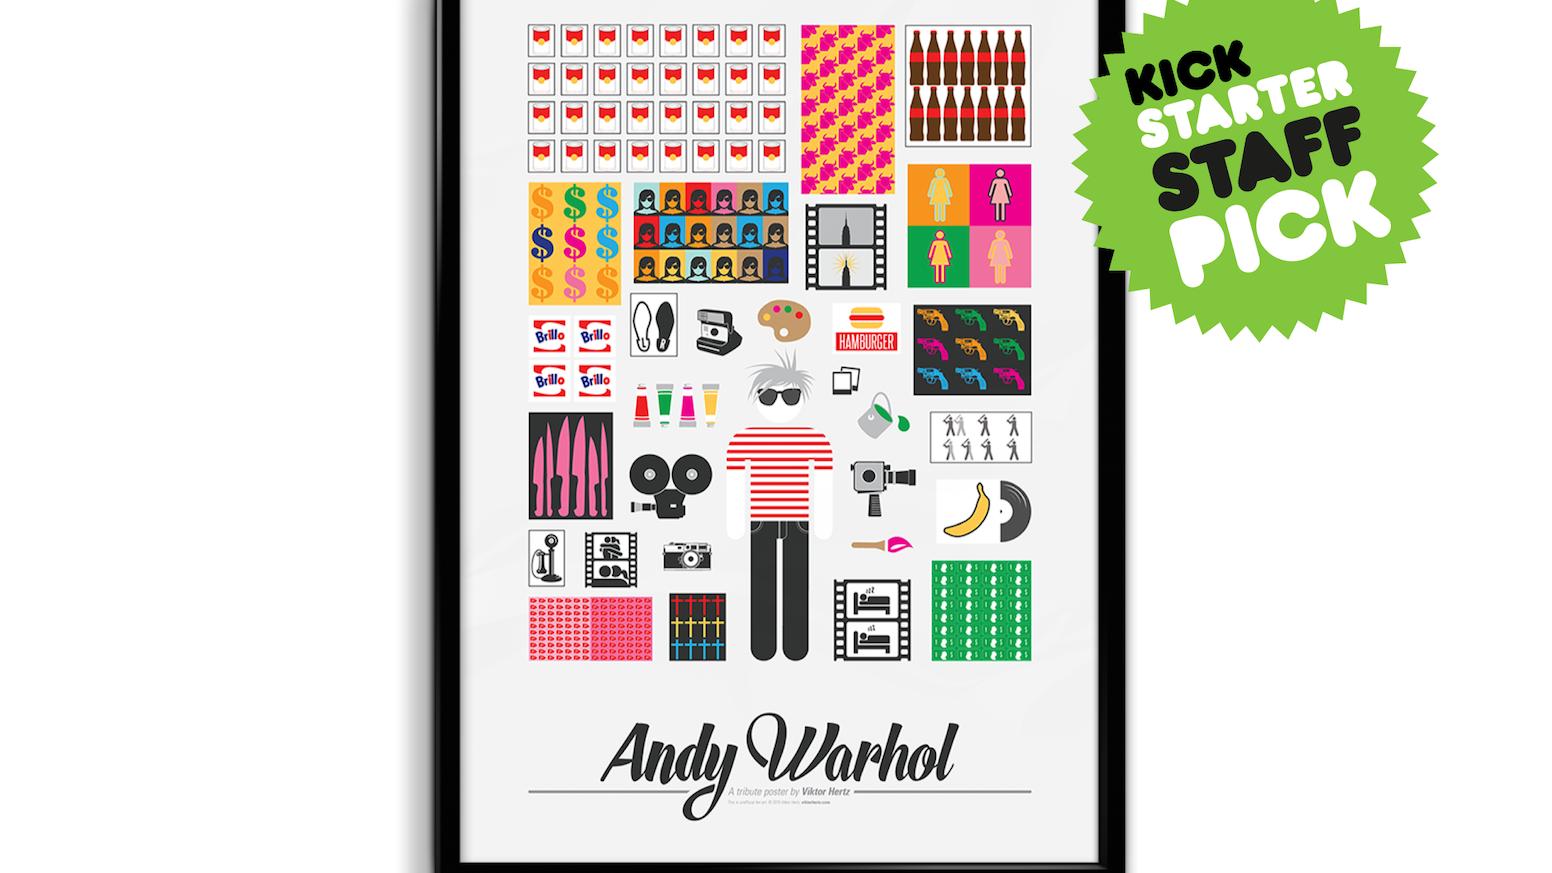 Andy Warhol pictogram poster by Viktor Hertz — Kickstarter